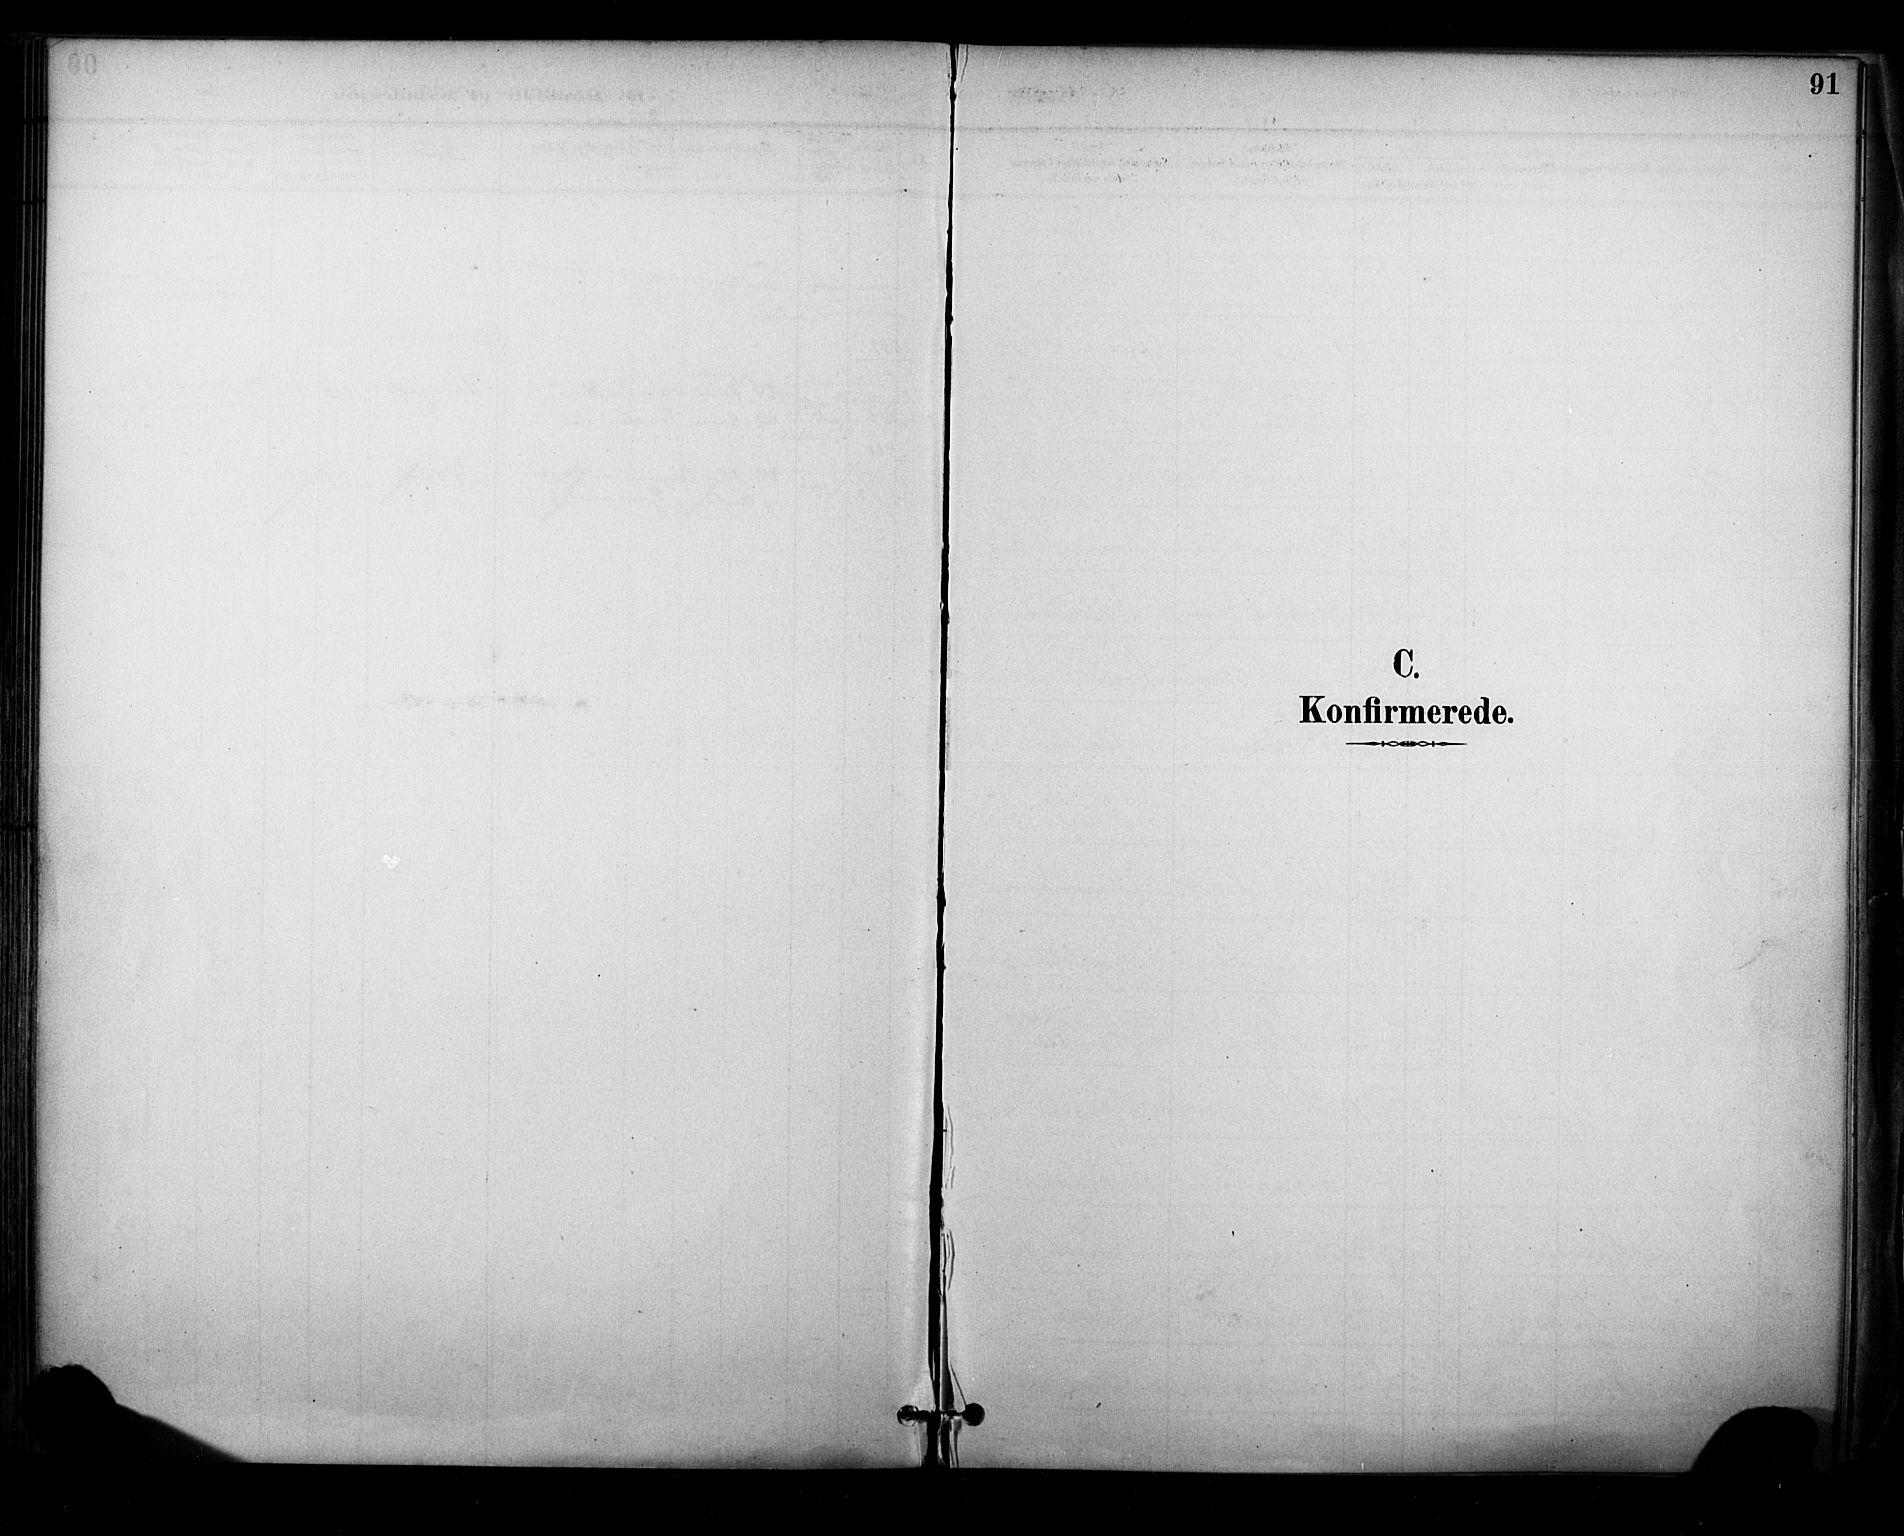 SAKO, Sauherad kirkebøker, F/Fa/L0009: Ministerialbok nr. I 9, 1887-1912, s. 91